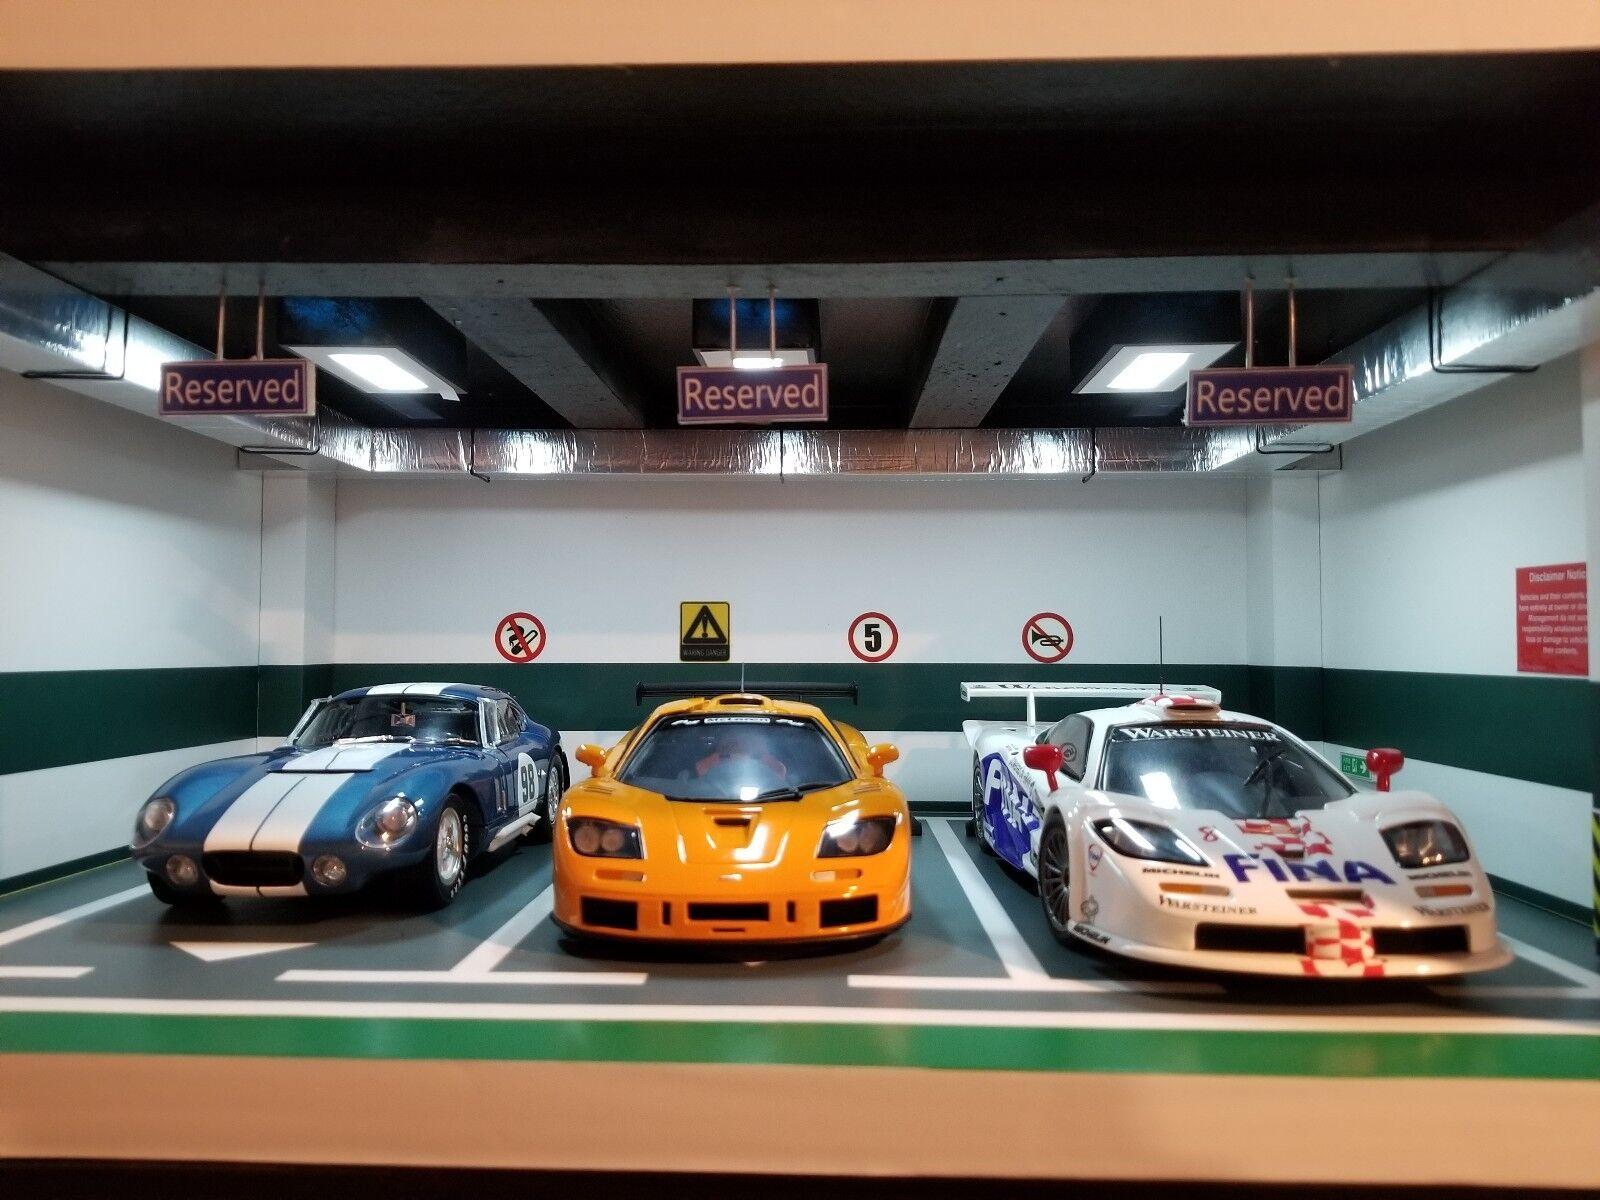 CMC,bilkonst,GMP,BBR, Classic billectables a 3 bildiorama parkeringarplats för 1 18